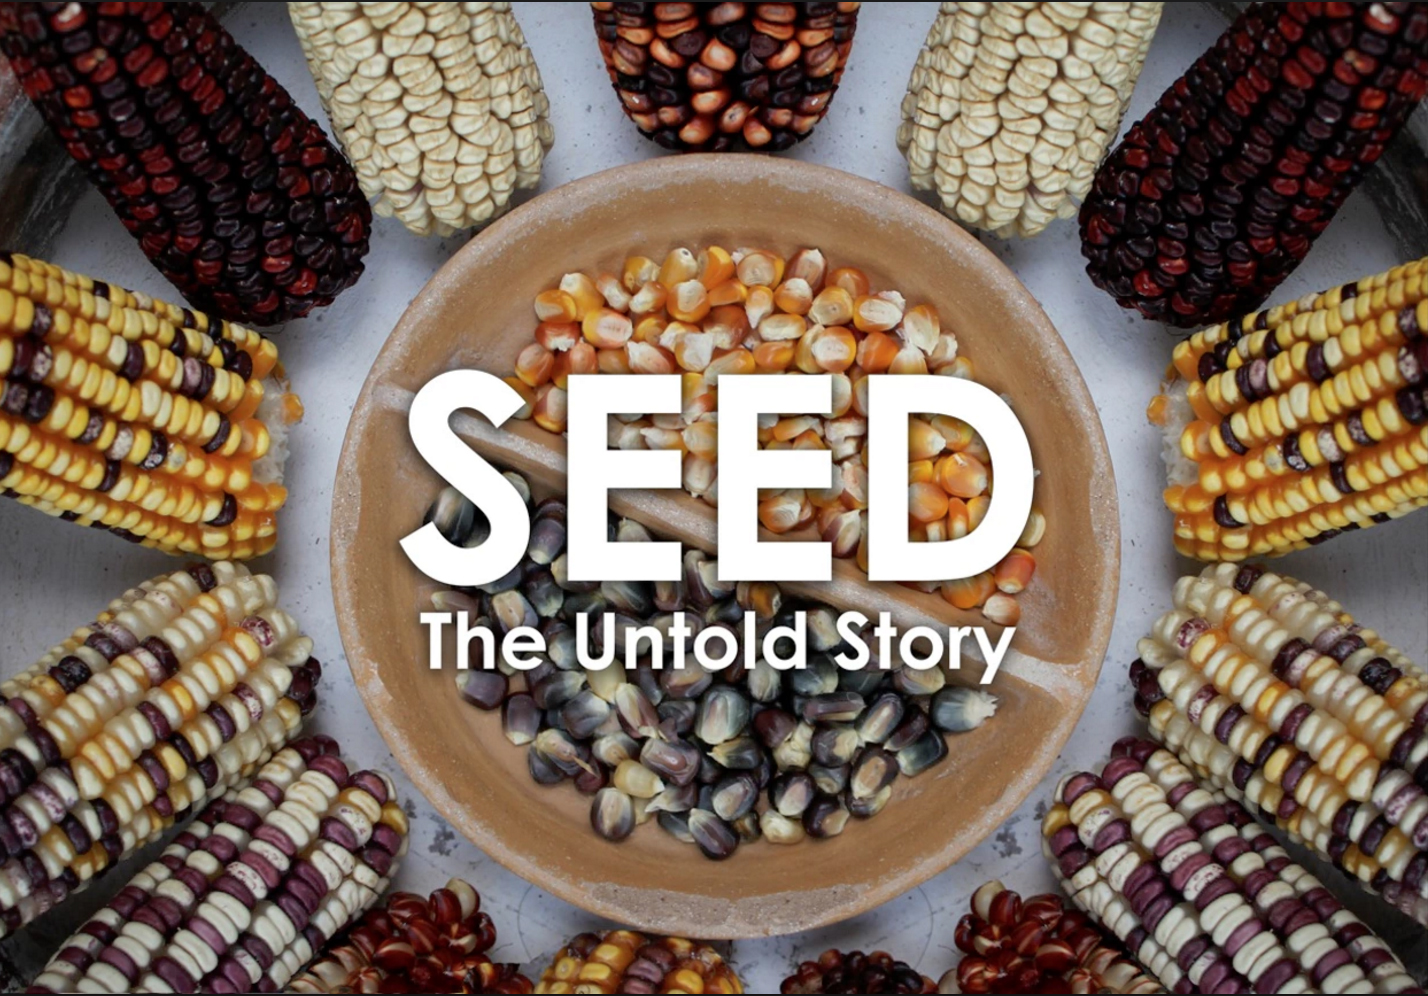 seed_title_2.jpg